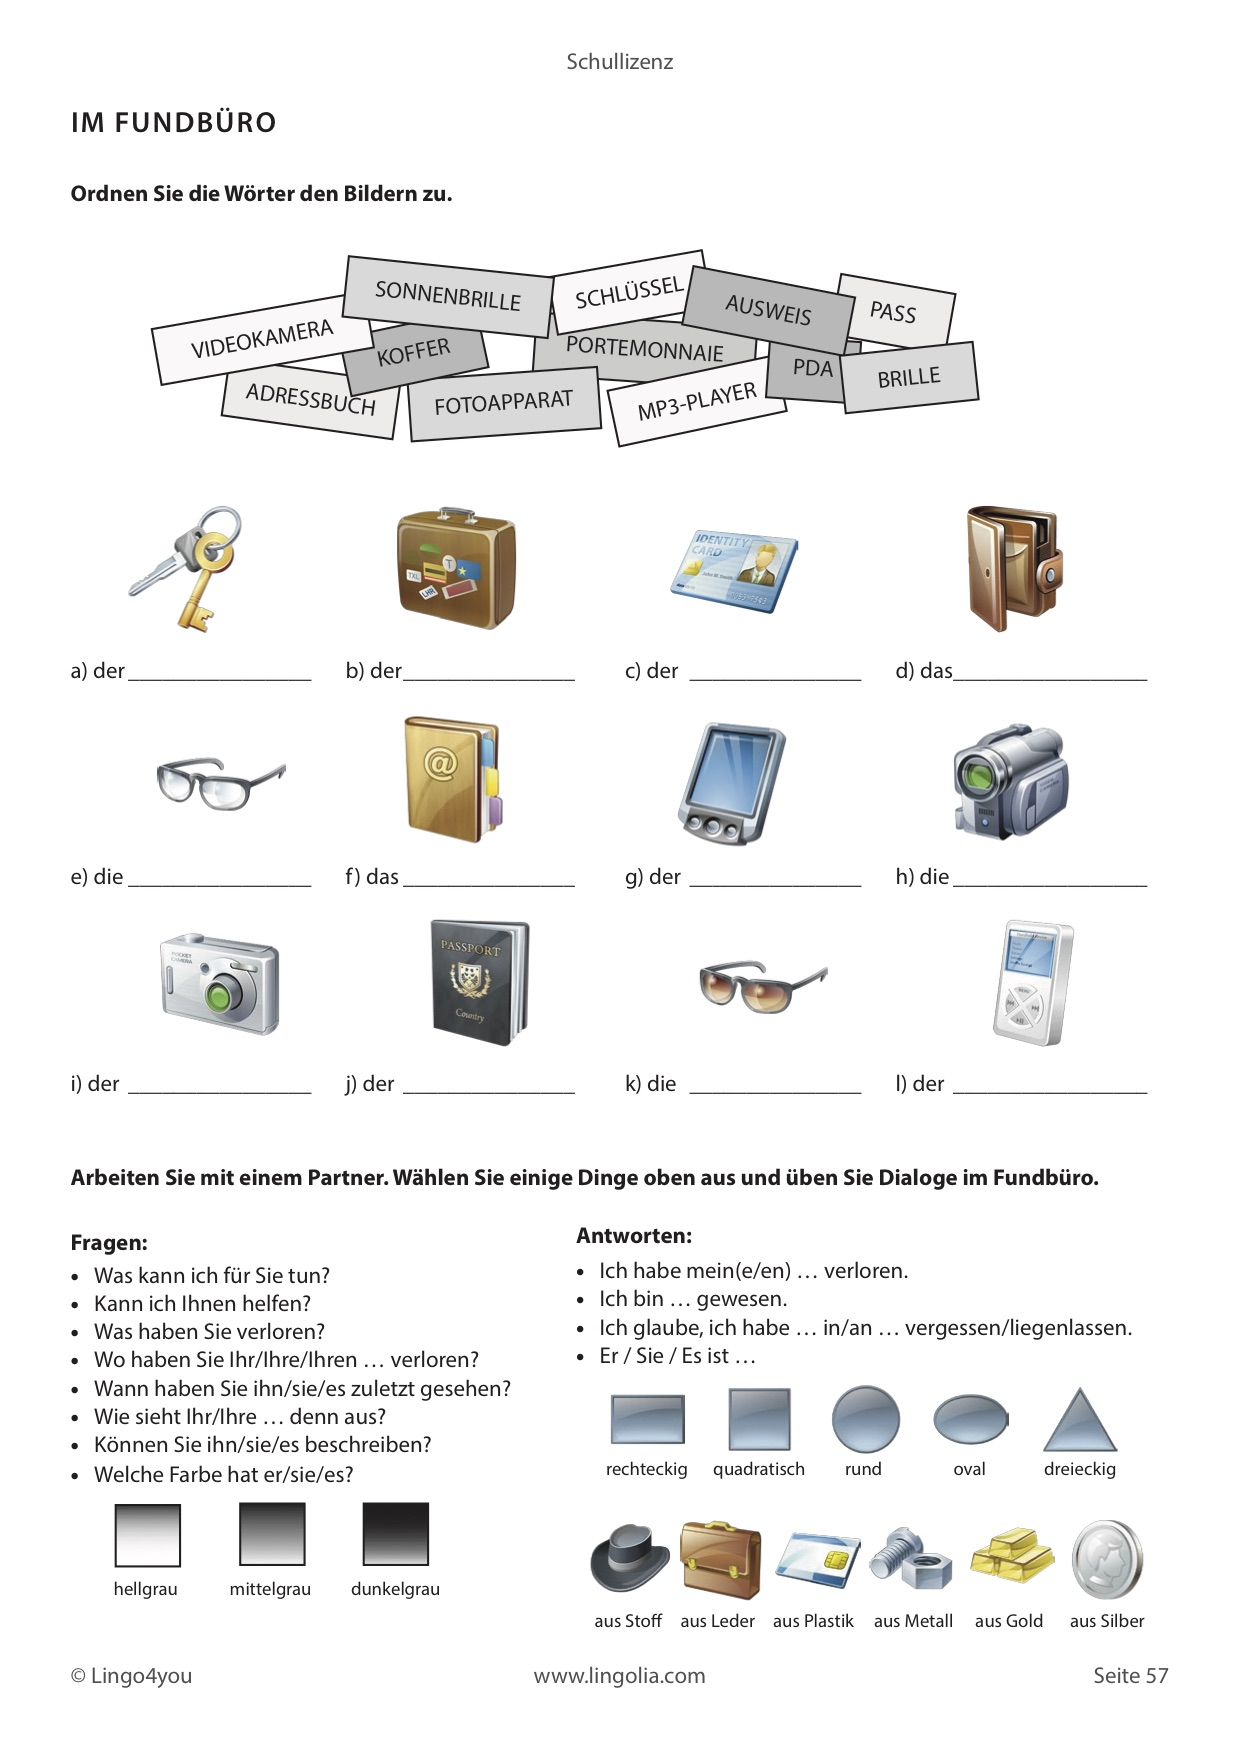 unterrichtsmaterial deutsch als fremdsprache lingolia shop. Black Bedroom Furniture Sets. Home Design Ideas